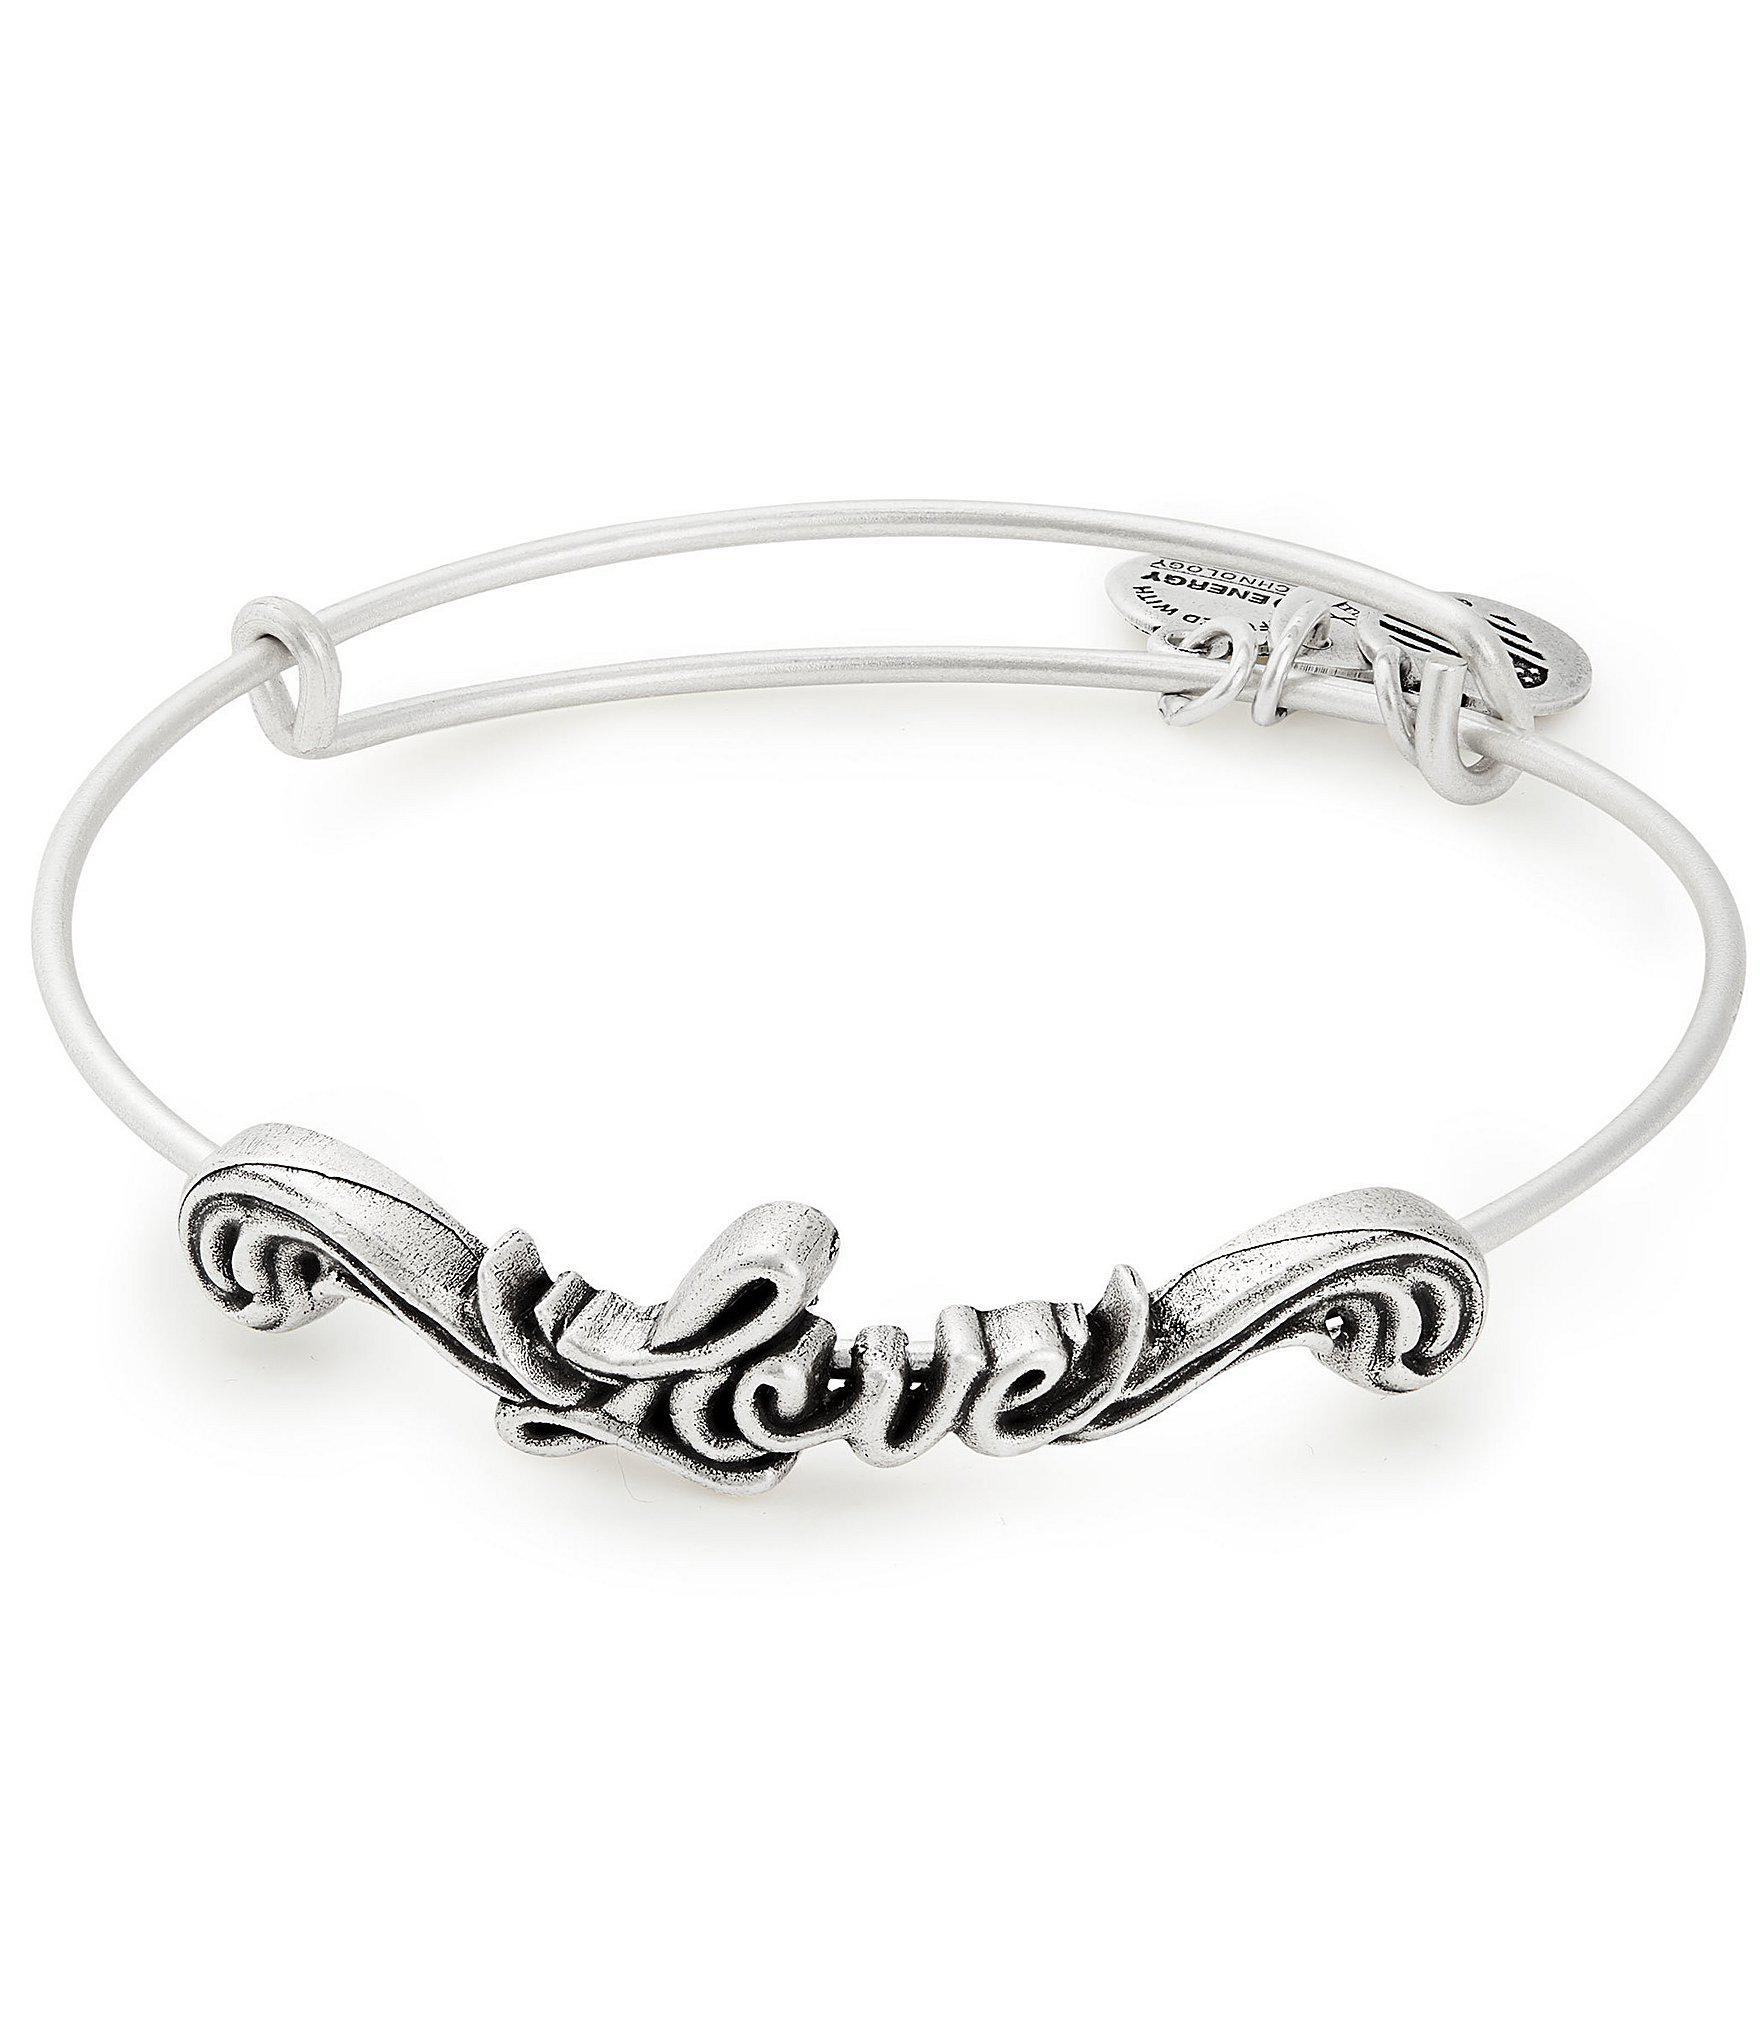 1f96e163812f6d Lyst - ALEX AND ANI Love Spiritual Armor Bangle Bracelet in Metallic